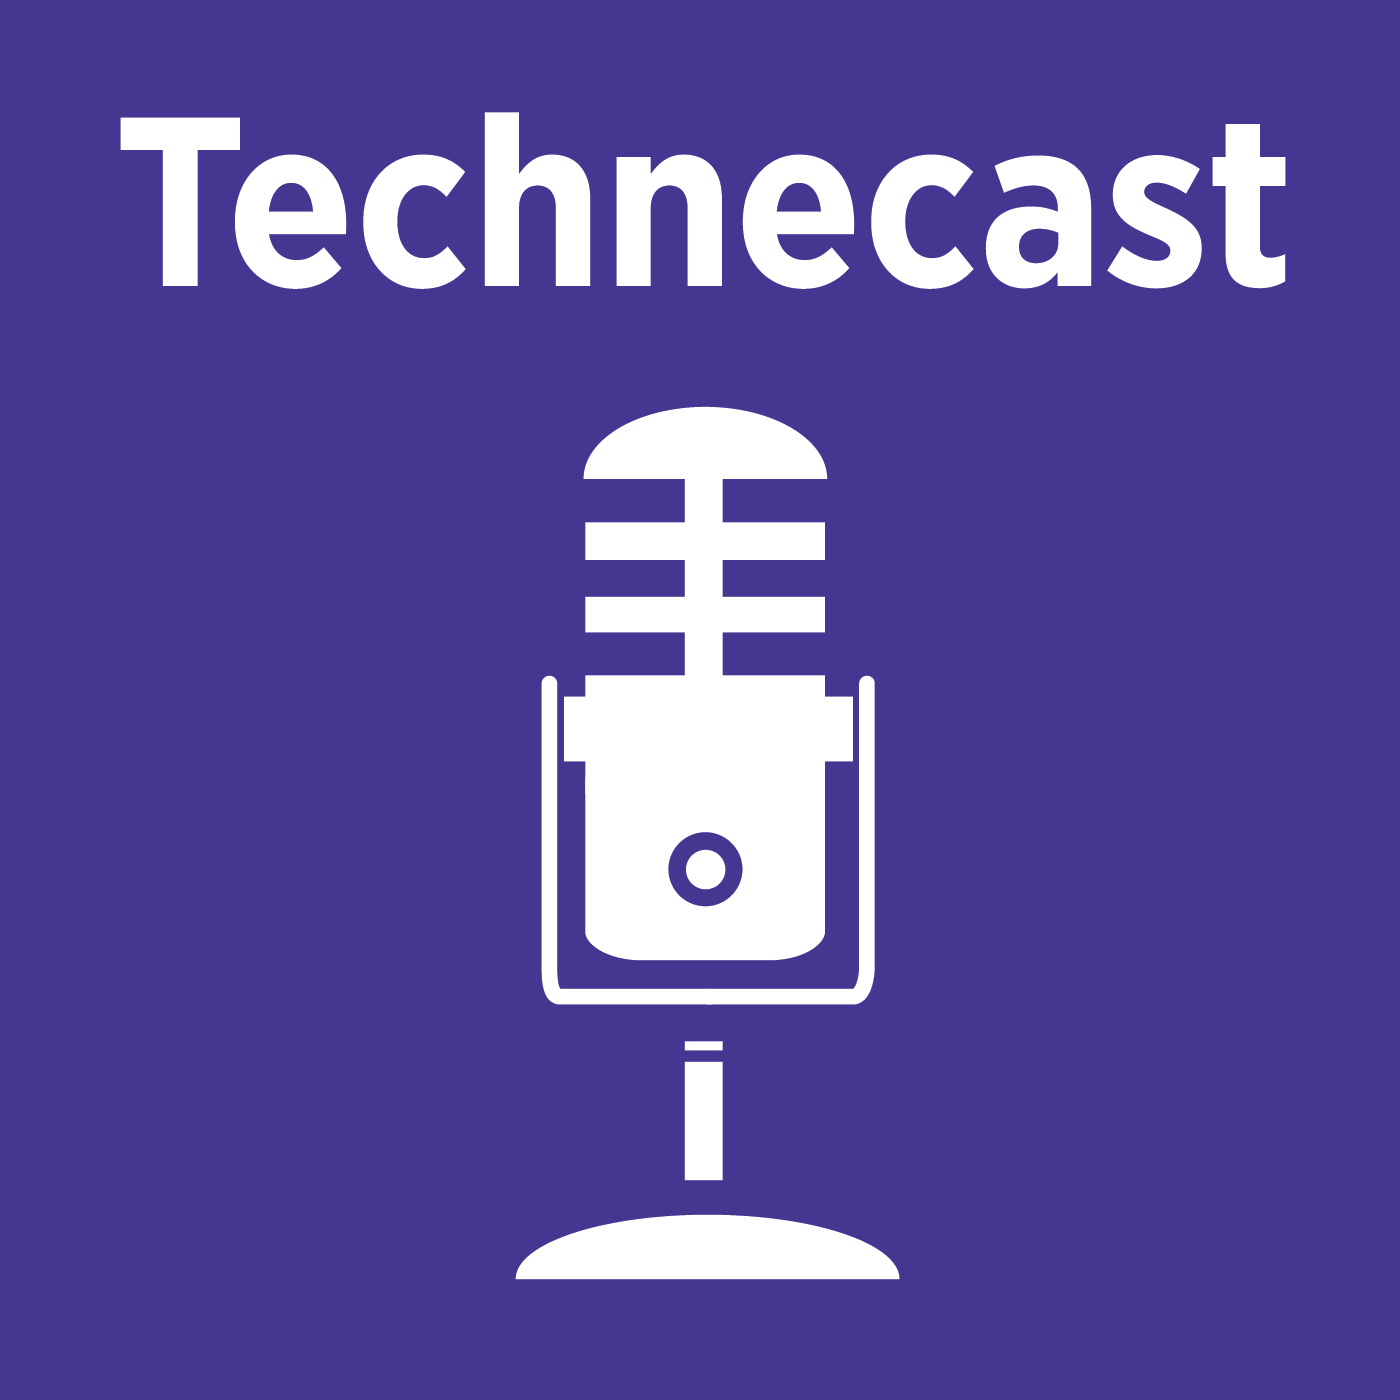 Technecast